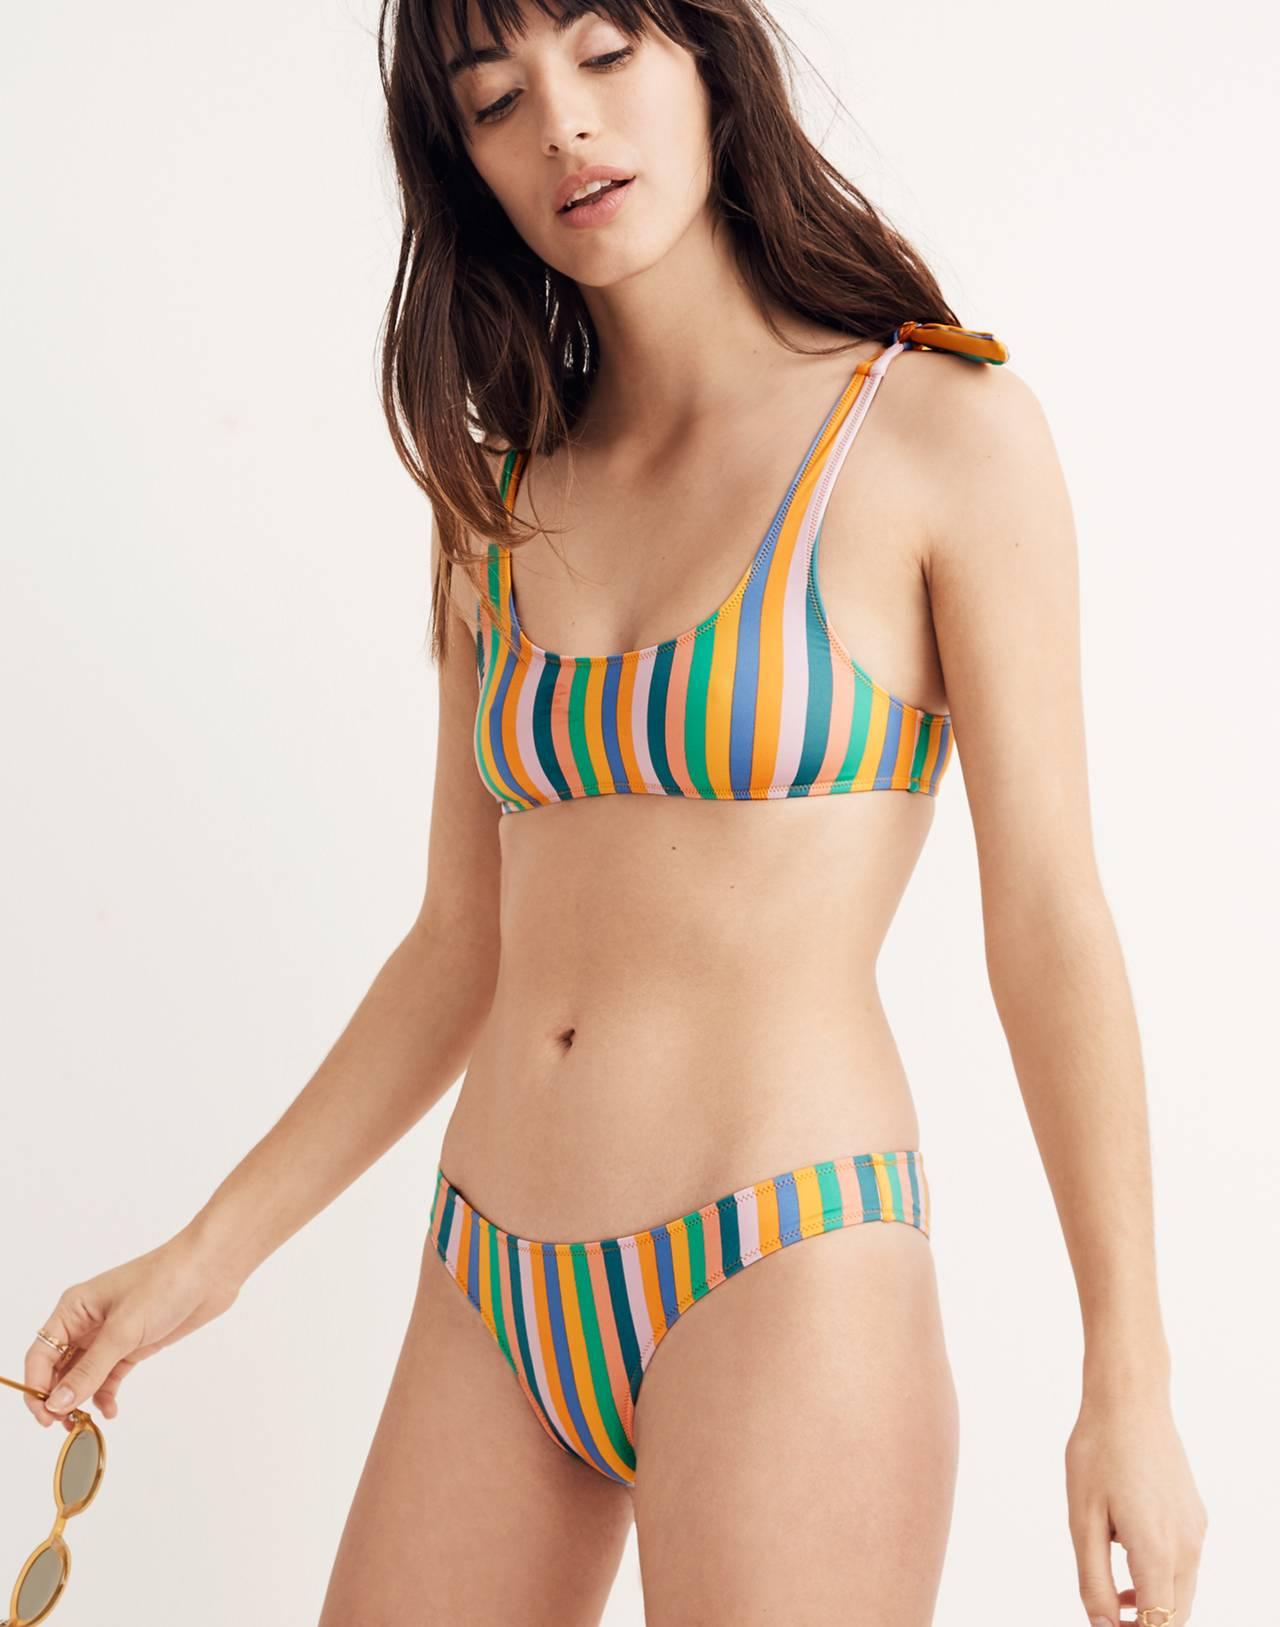 J.Crew Playa Nantucket Cheeky Bikini Bottom in Stripe in stripe multi image 1